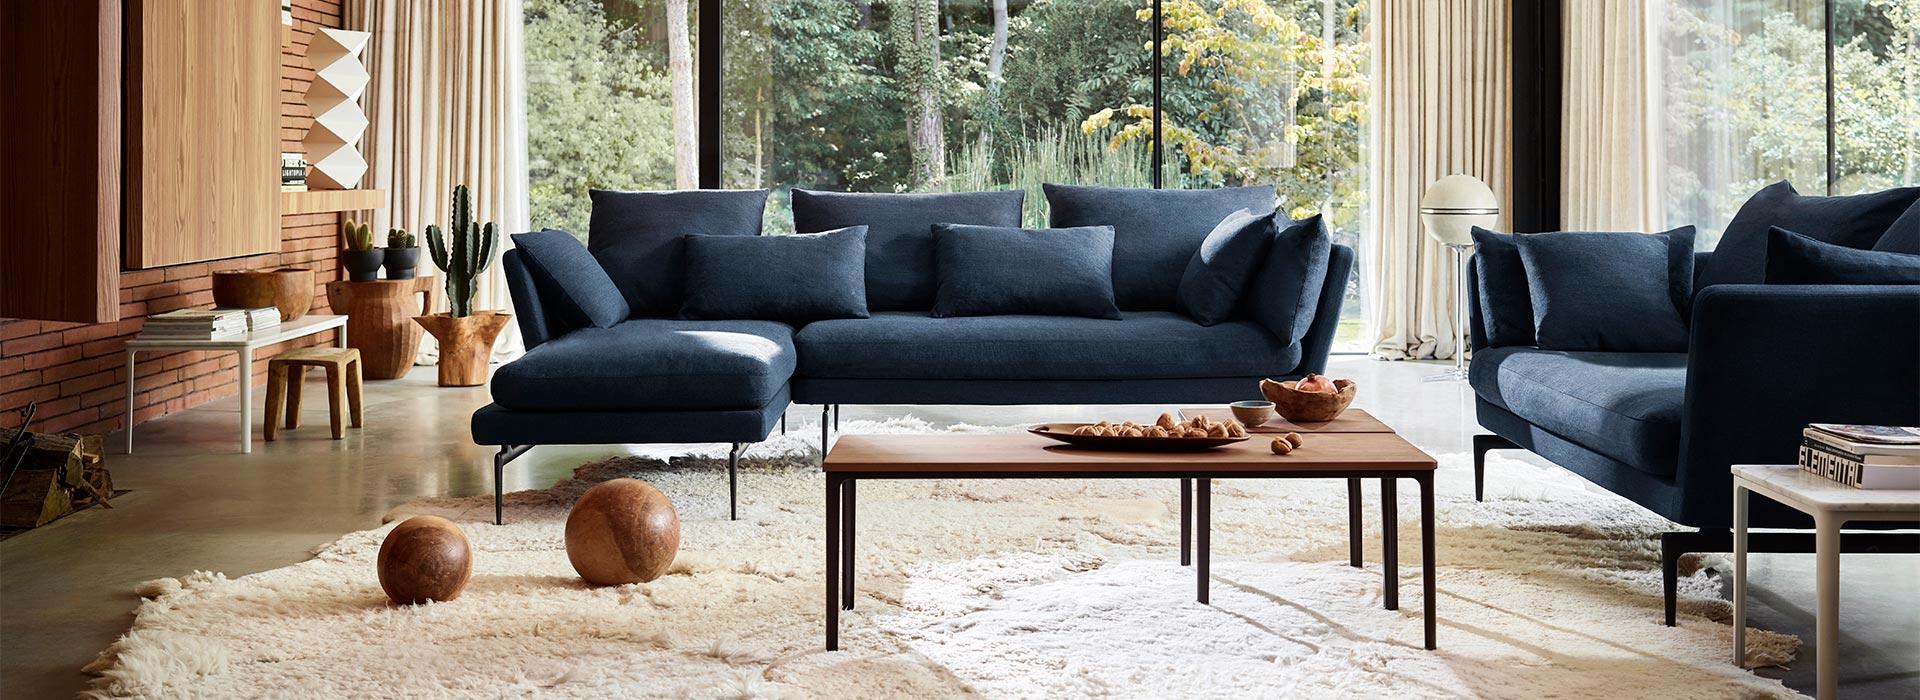 vitra suita sofa campaign in berlin bei steidten+